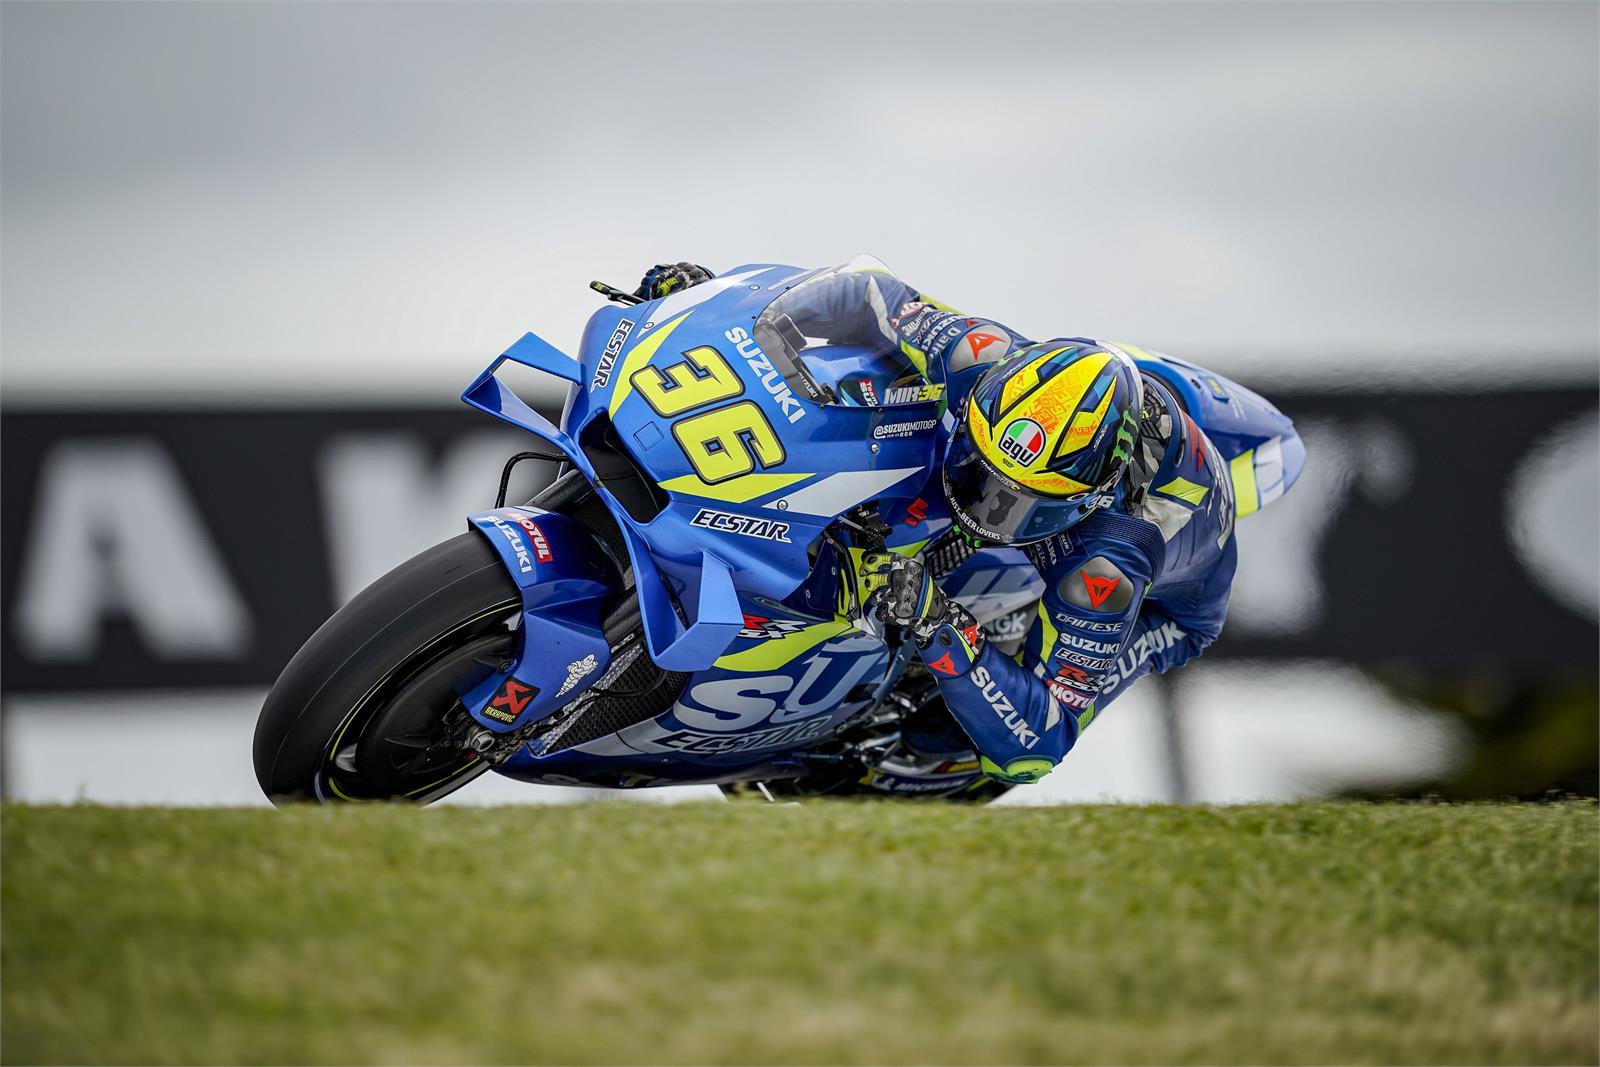 MotoGP2019マレーシアGP ミル「初表彰台はマレーシアで獲得出来るかも」